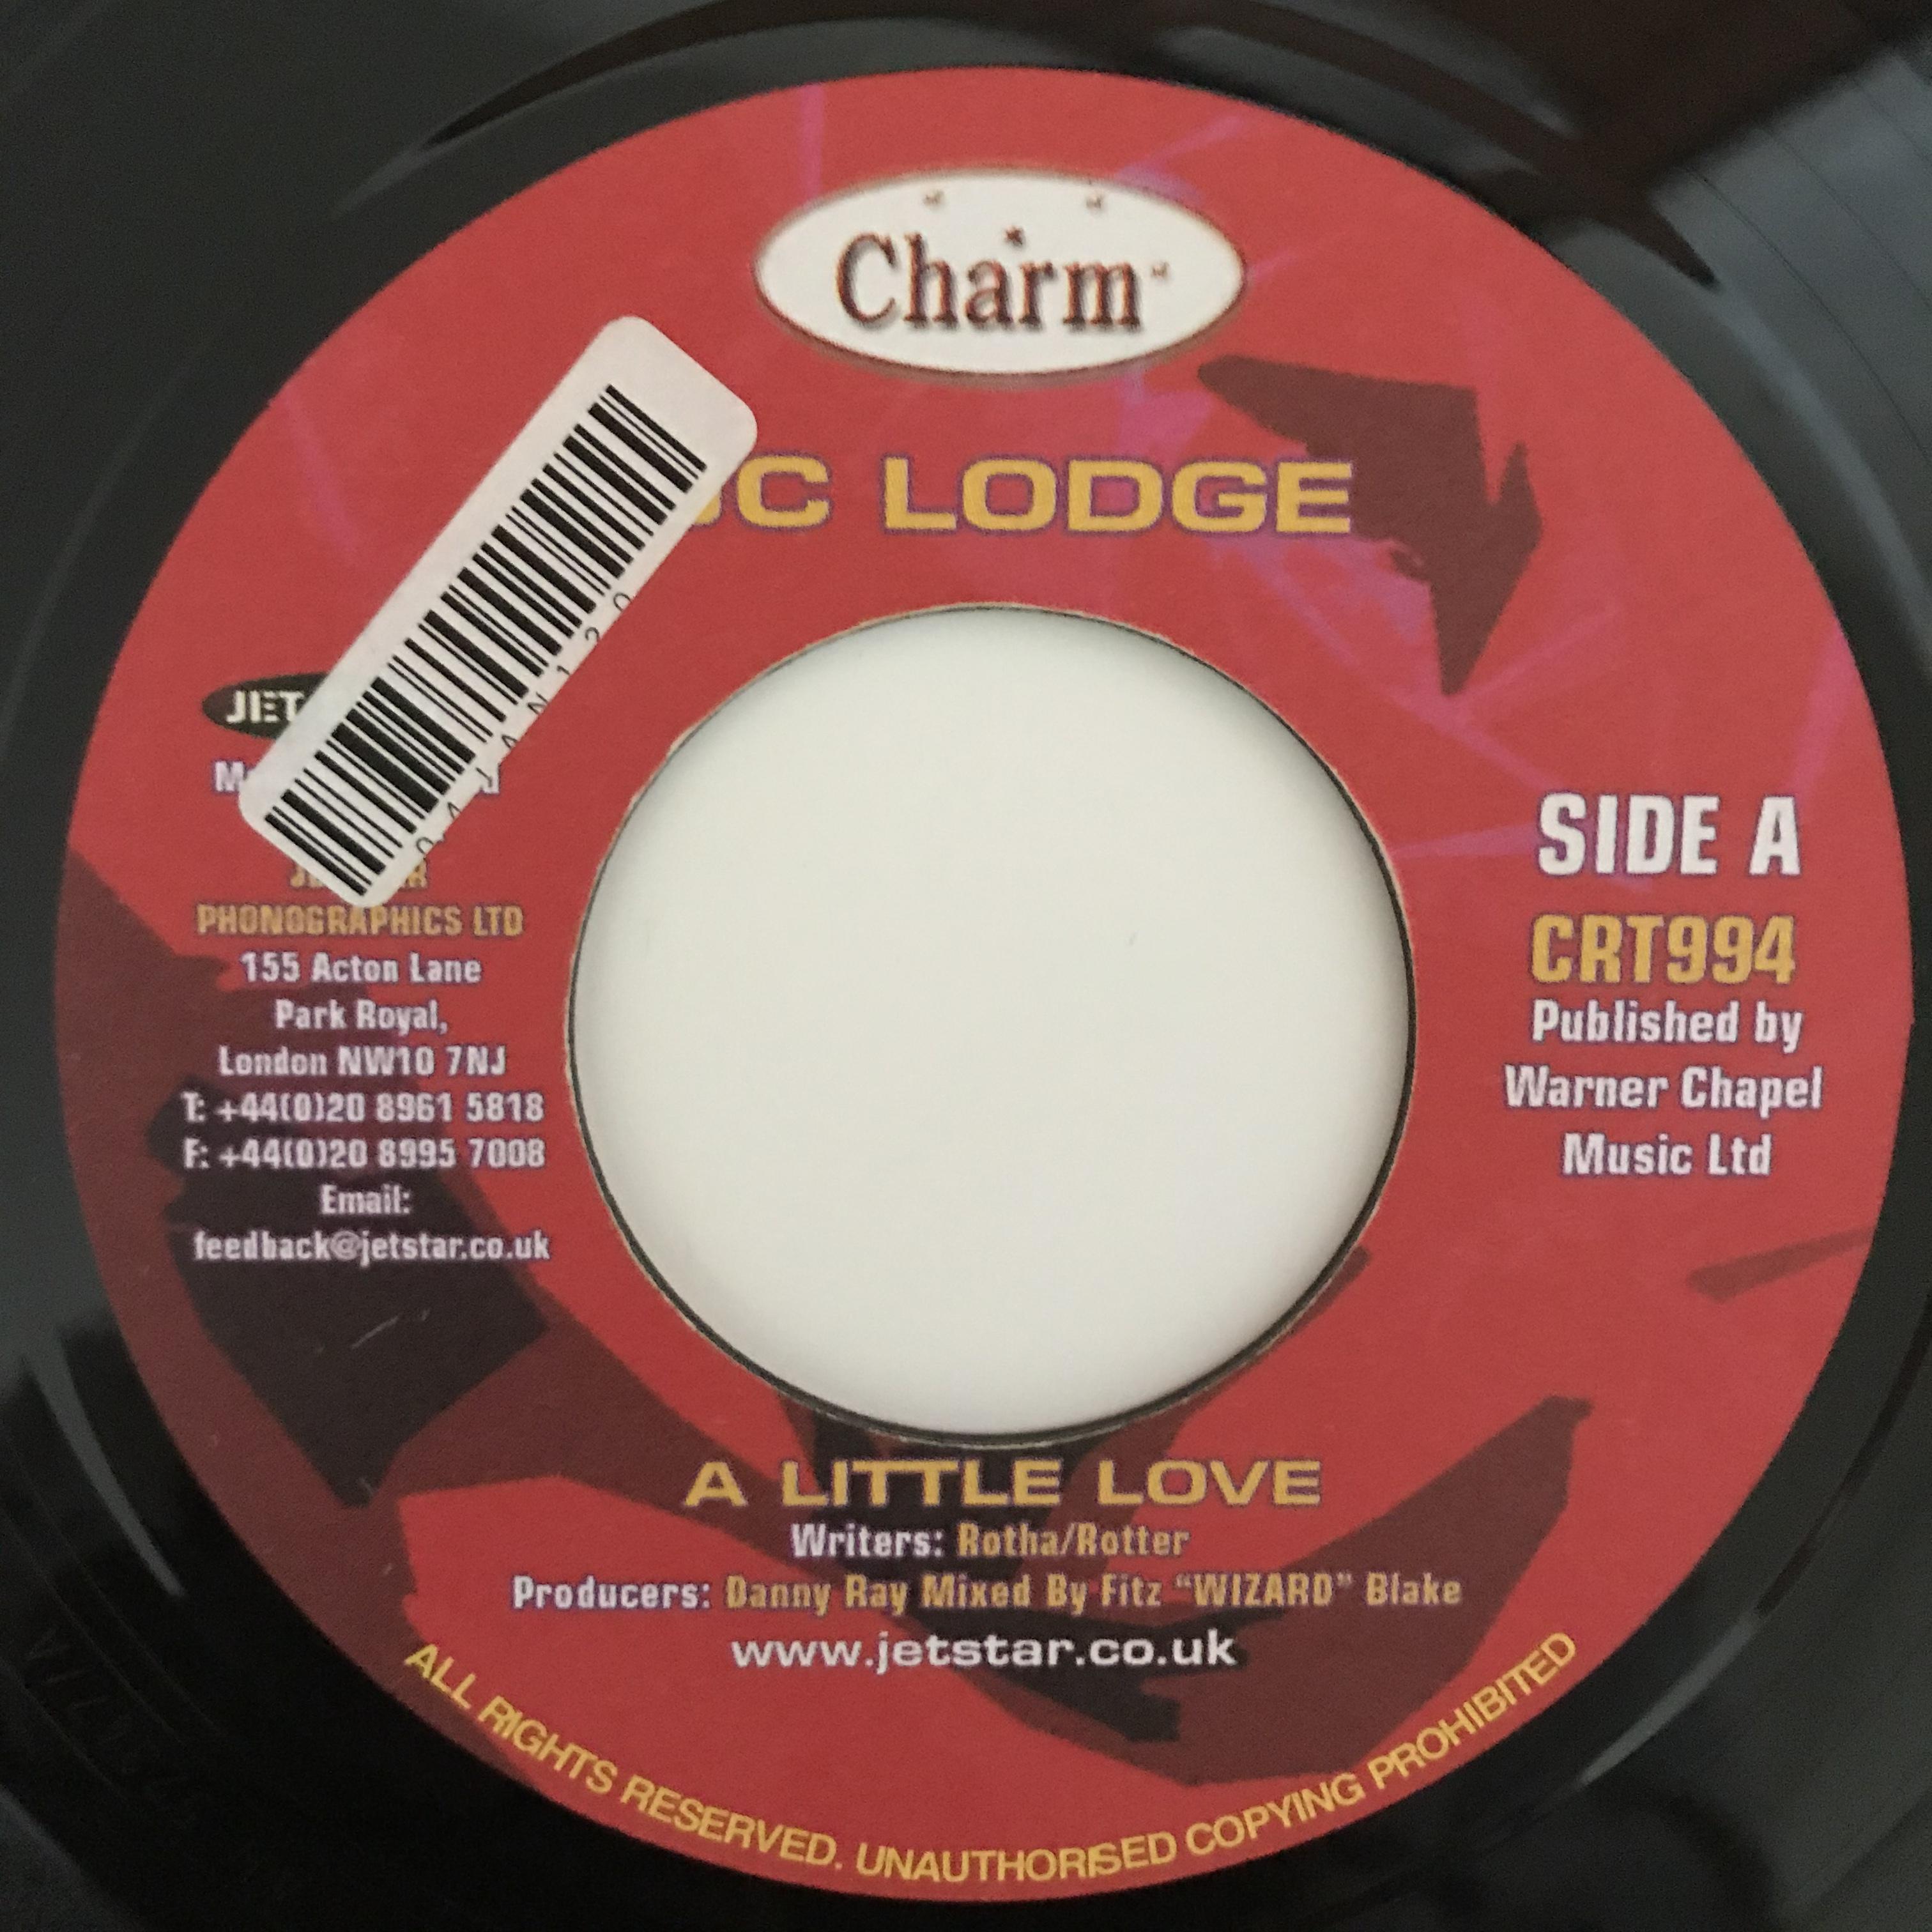 Jc Lodge - A Little Love【7-10868】